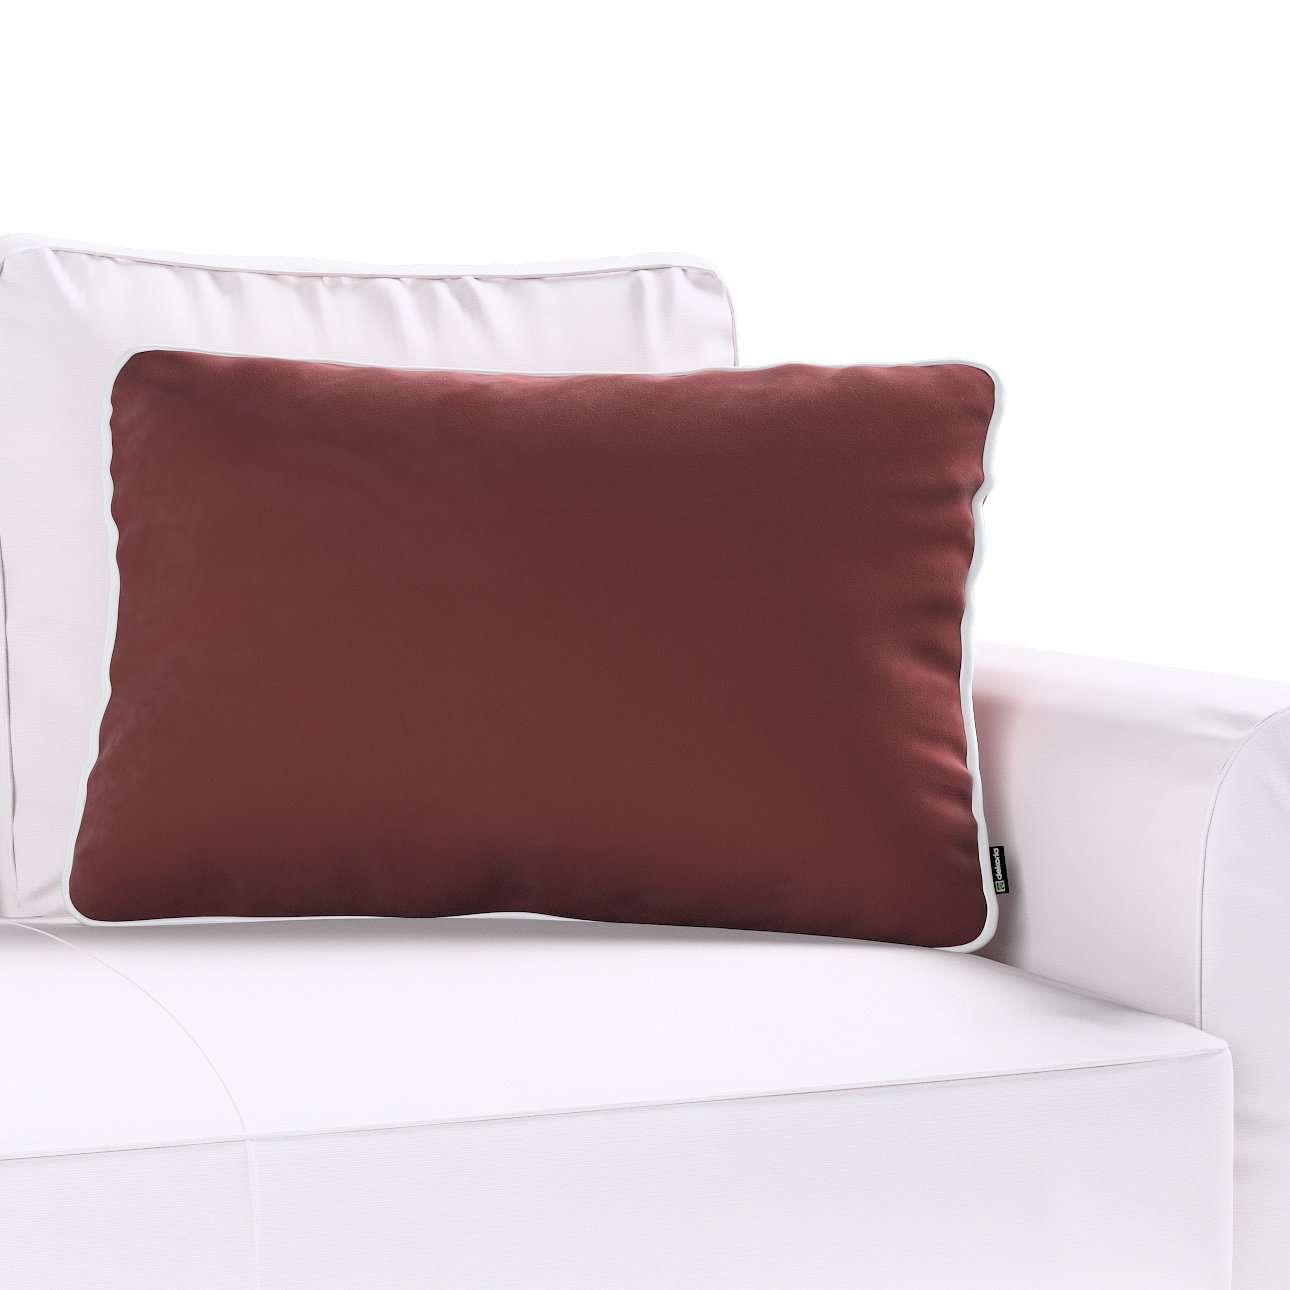 Poszewka Laura na poduszkę prostokątna 60 × 40 cm w kolekcji Velvet, tkanina: 704-26